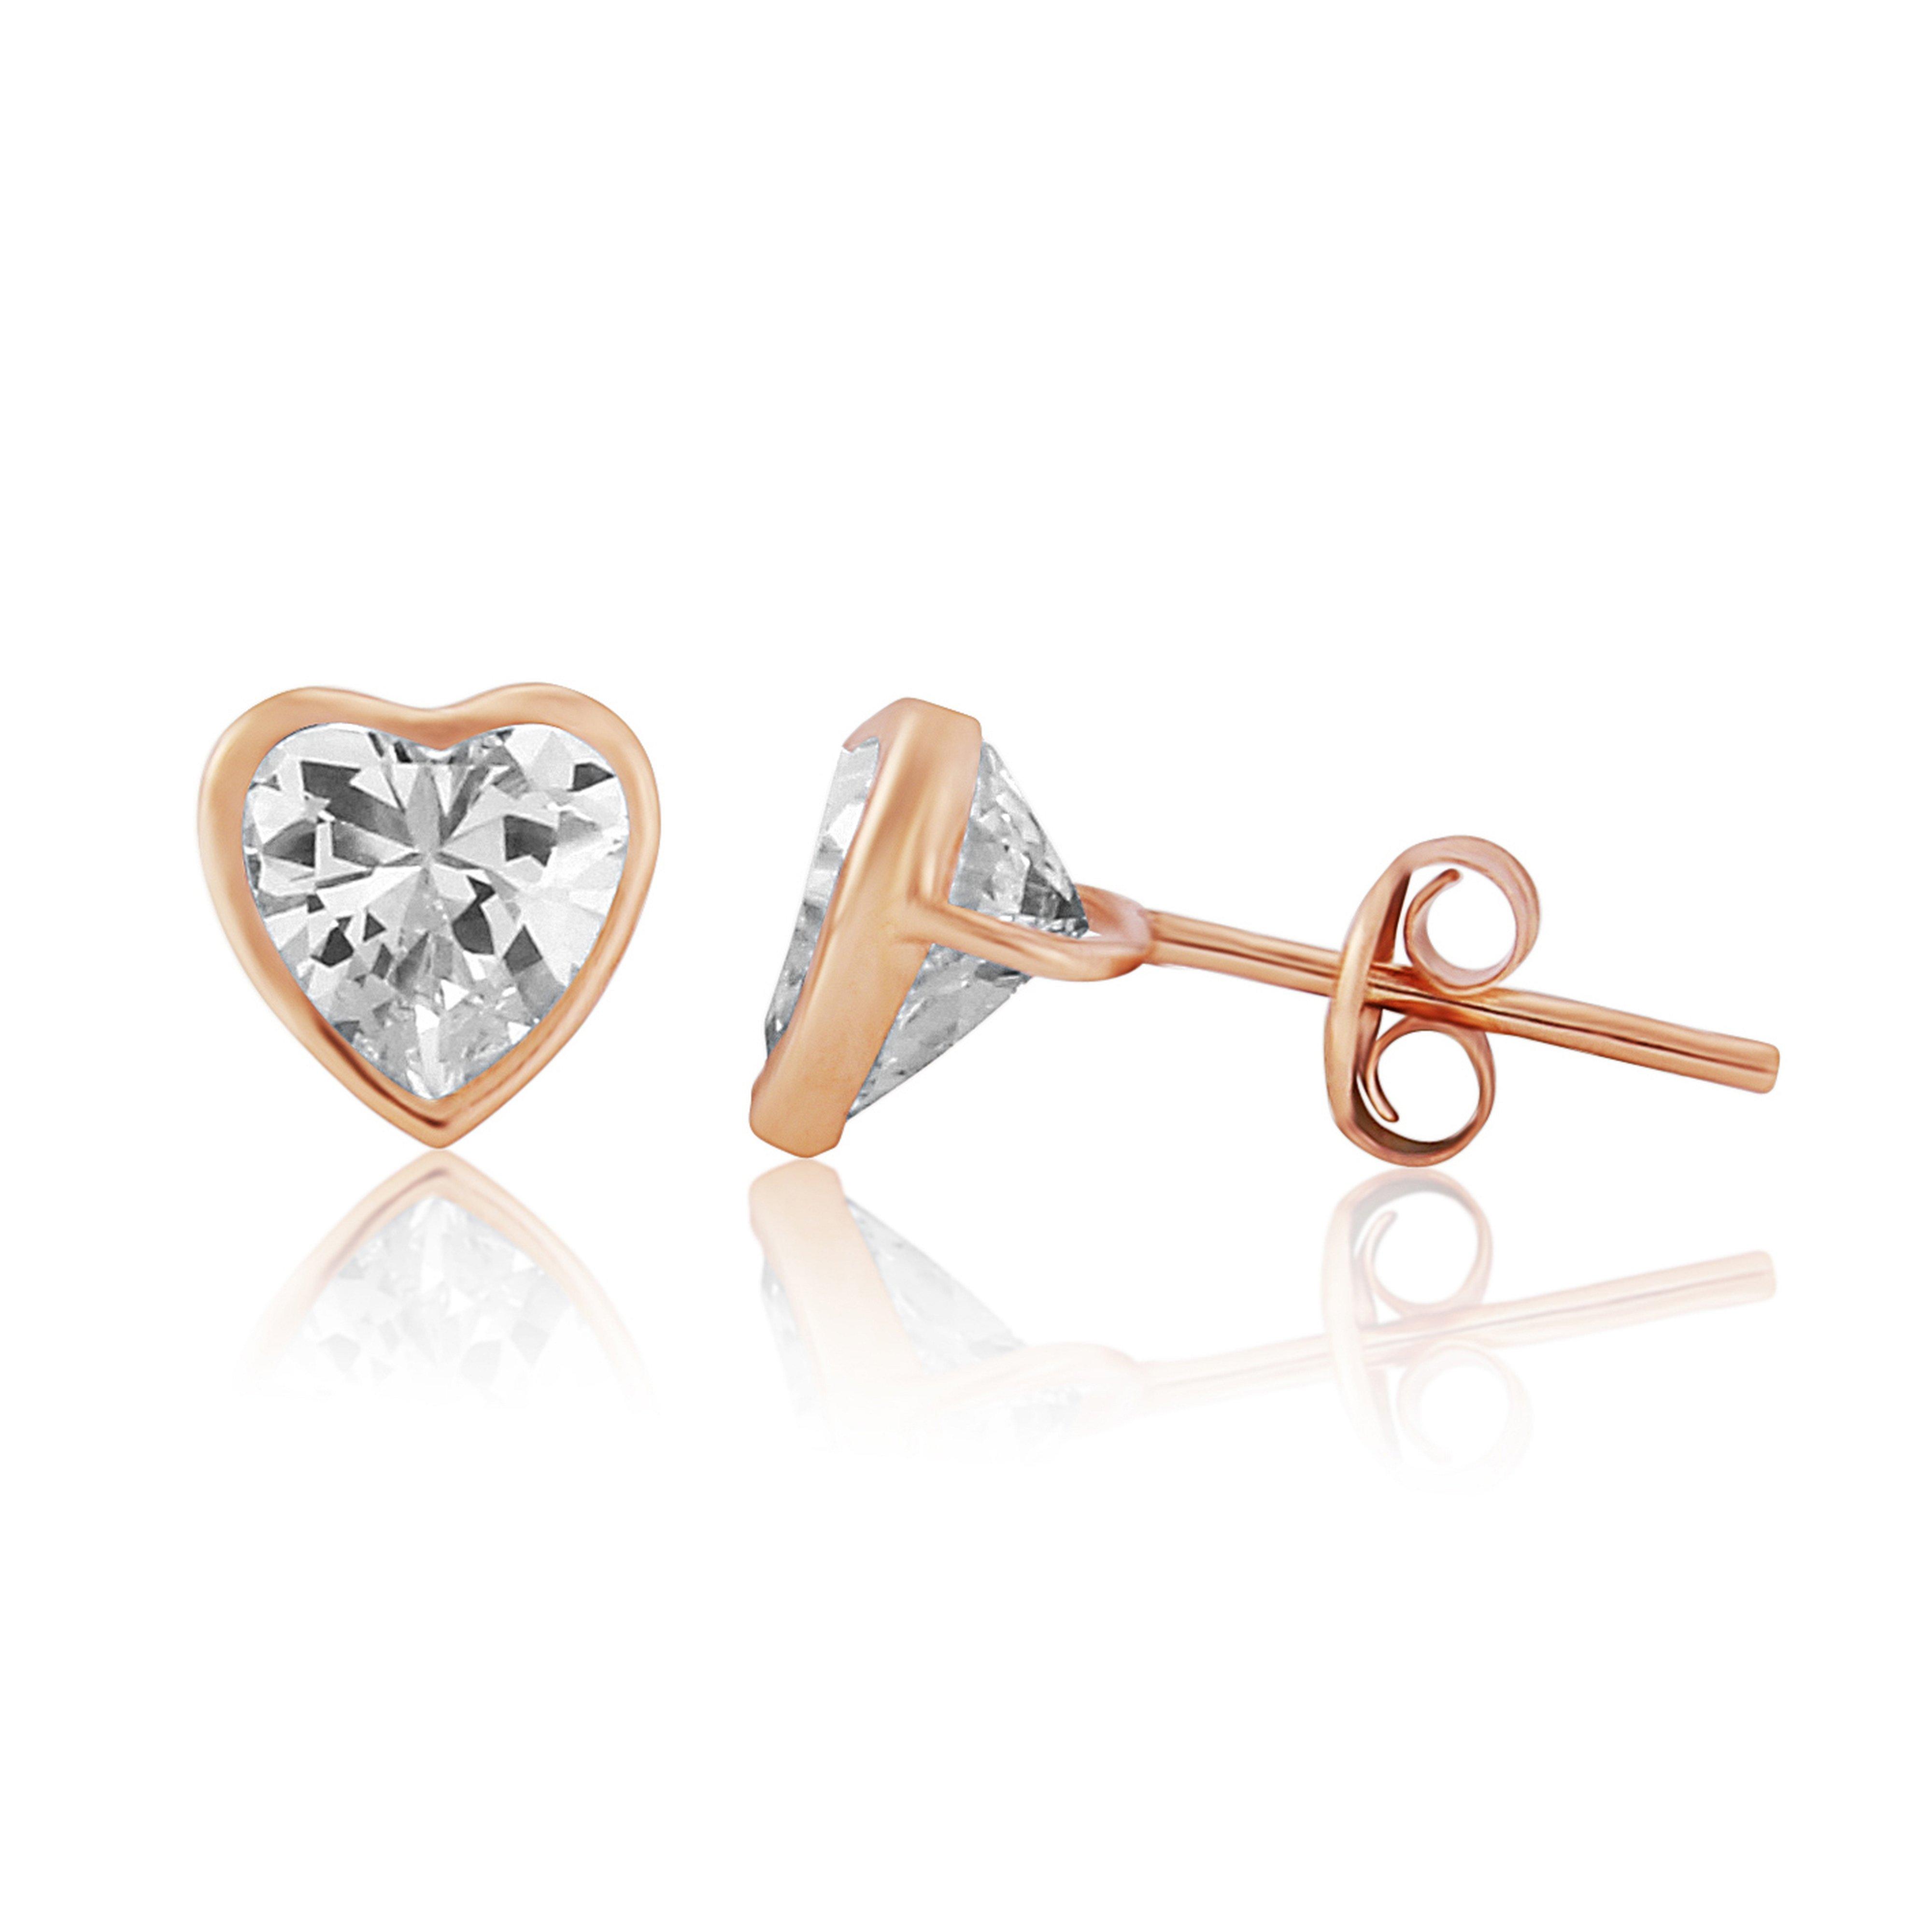 9ct Rose Gold Heart CZ Stud Earrings